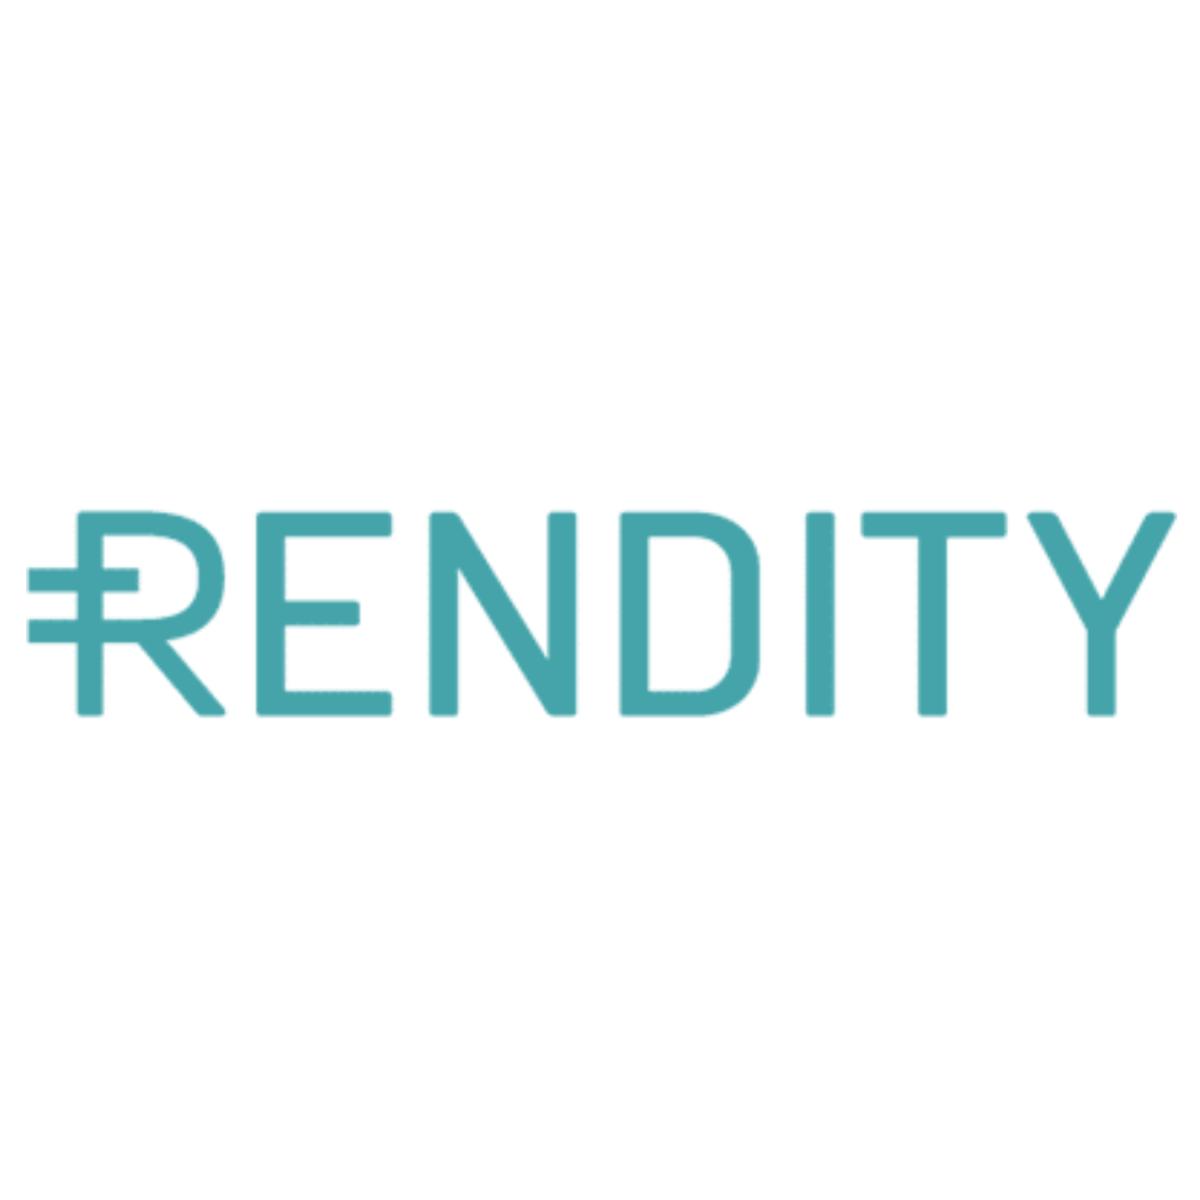 Rendity Logo @ Savings4Freedom